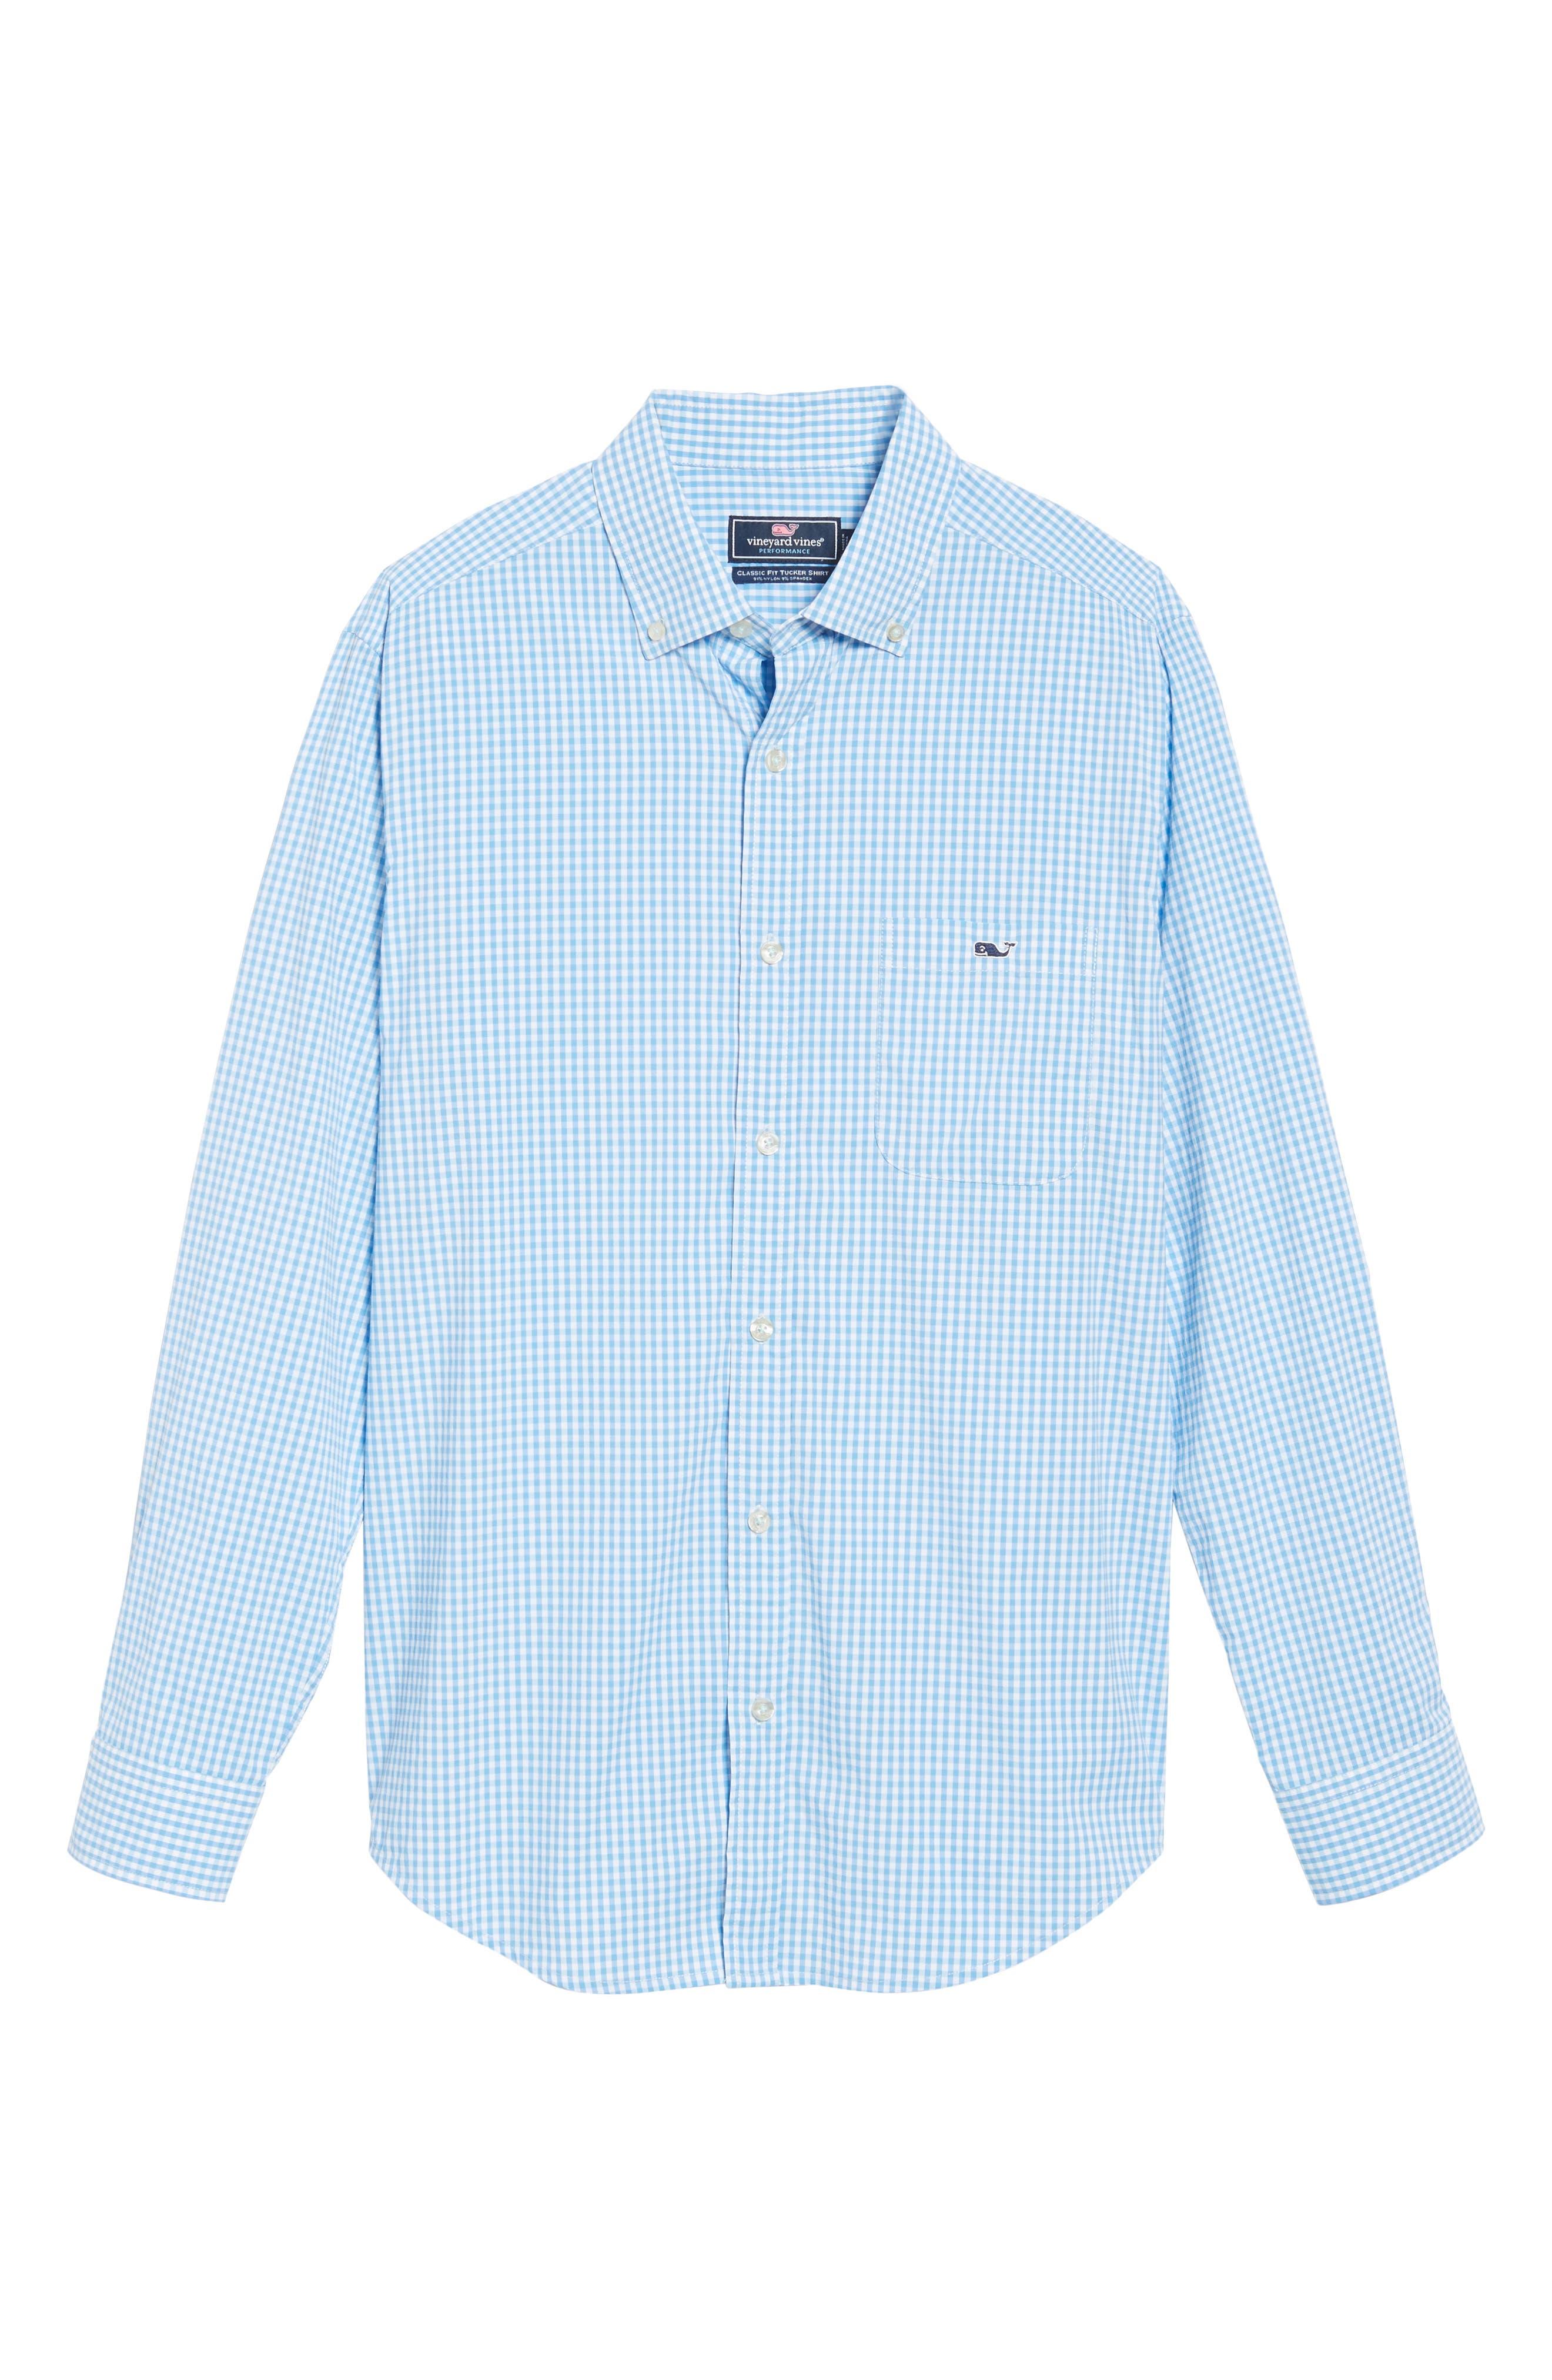 Seawater Gingham Performance Sport Shirt,                             Alternate thumbnail 6, color,                             Hull Blue